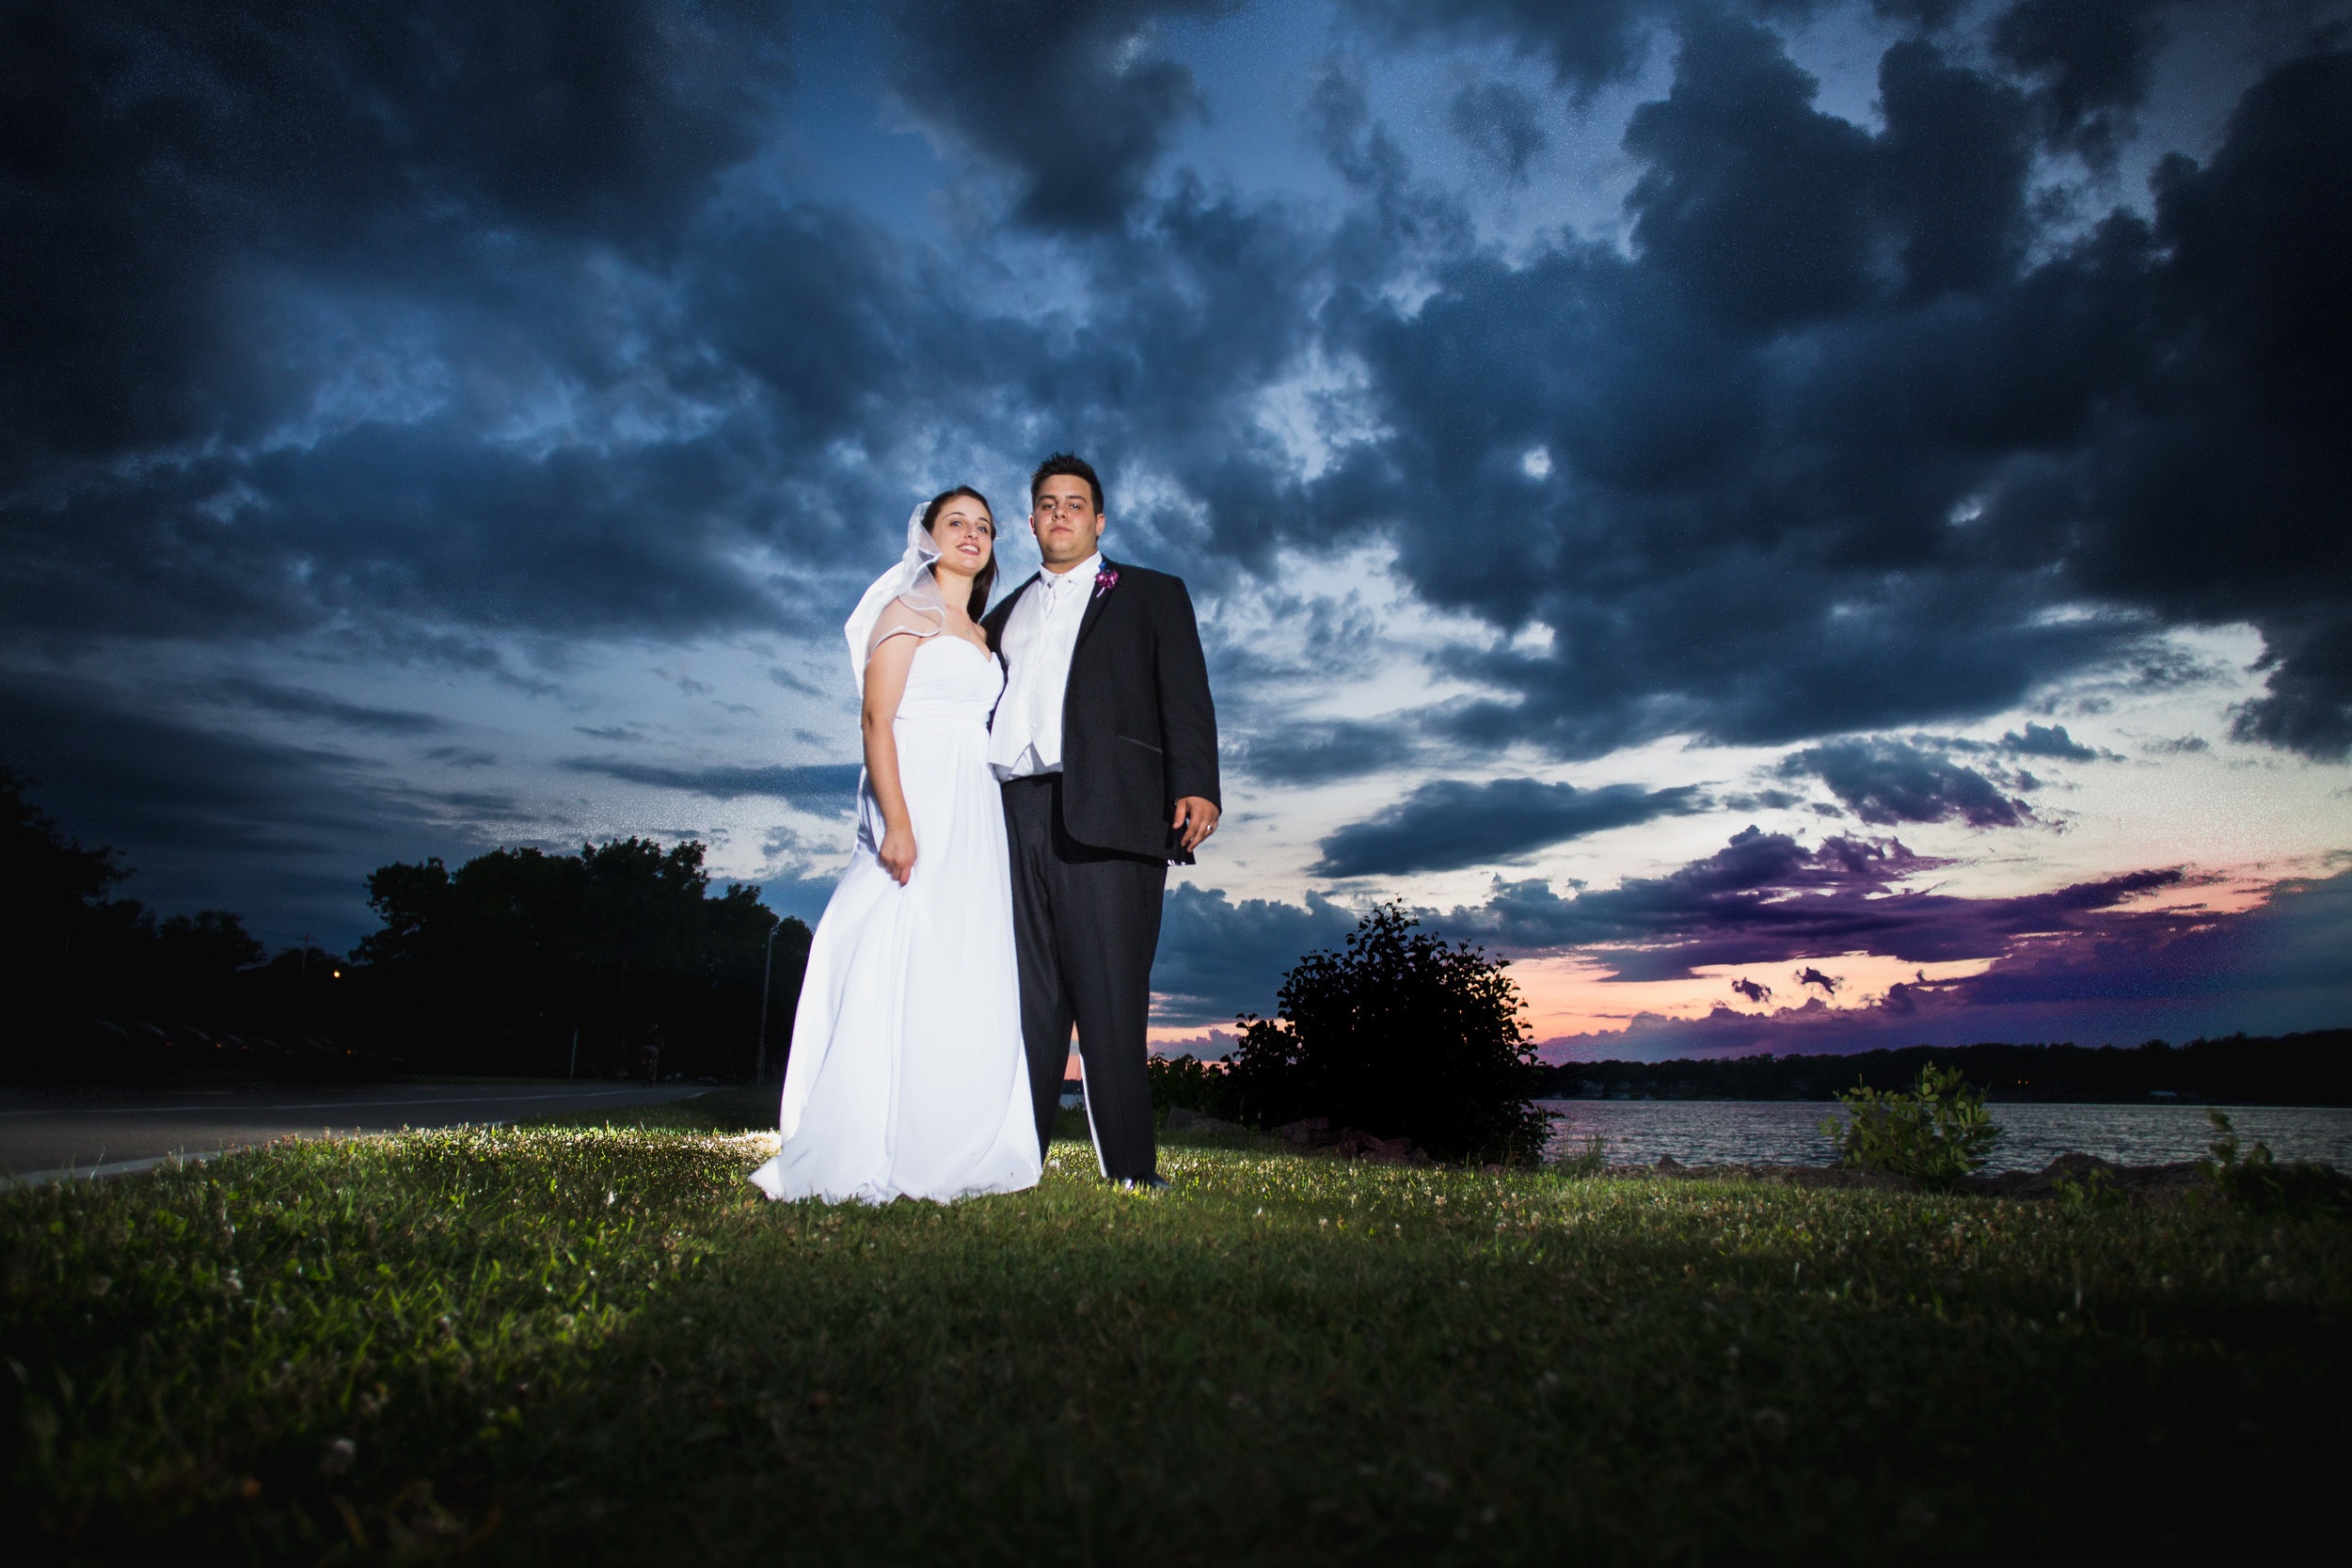 Stephanie-and-Mitchell-Buffalo-NY-Wedding-Stefan-Ludwig-Photography-231.jpg